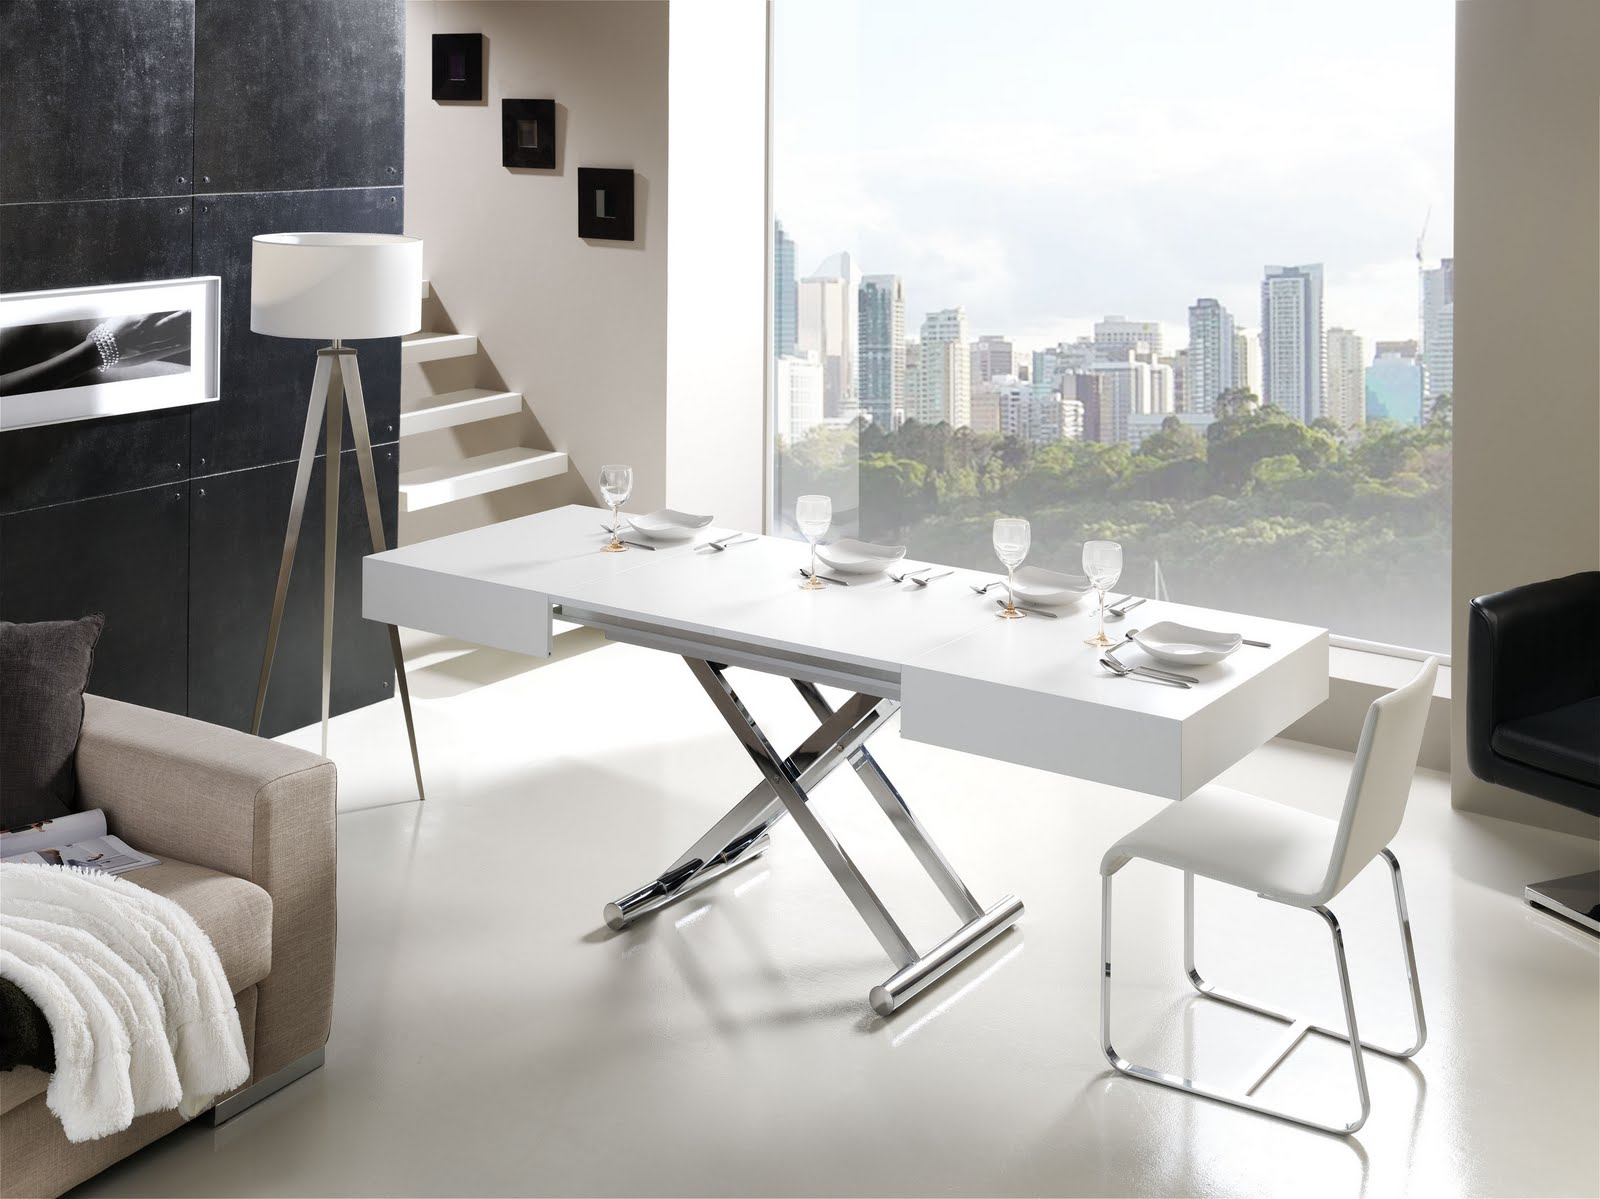 Mesa Salon Plegable D0dg Mesa Centro Activa Elevable Y Extensible A Edor Muebles Xikara